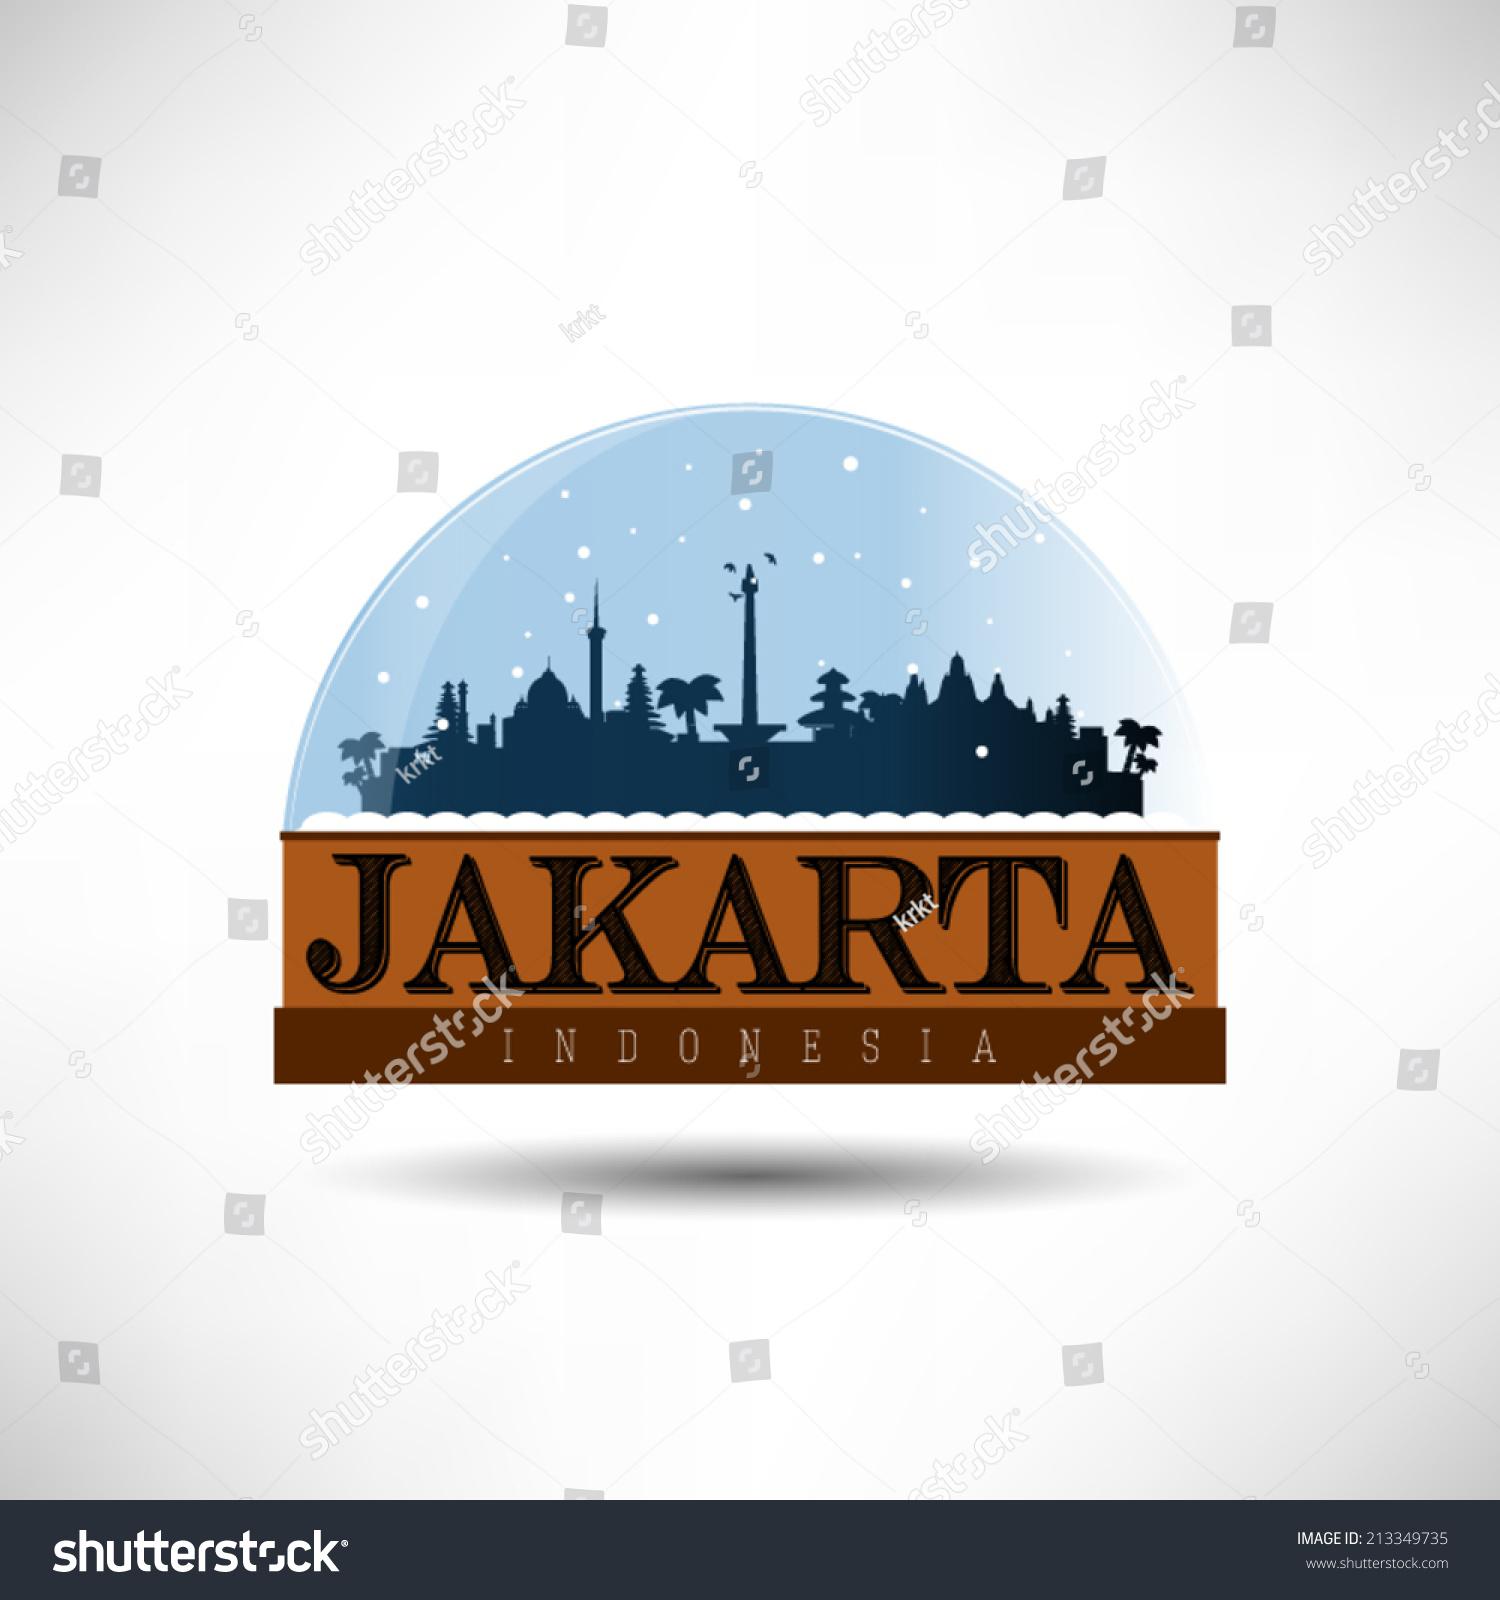 Jakarta Indonesia City Skyline Silhouette Snow Stock